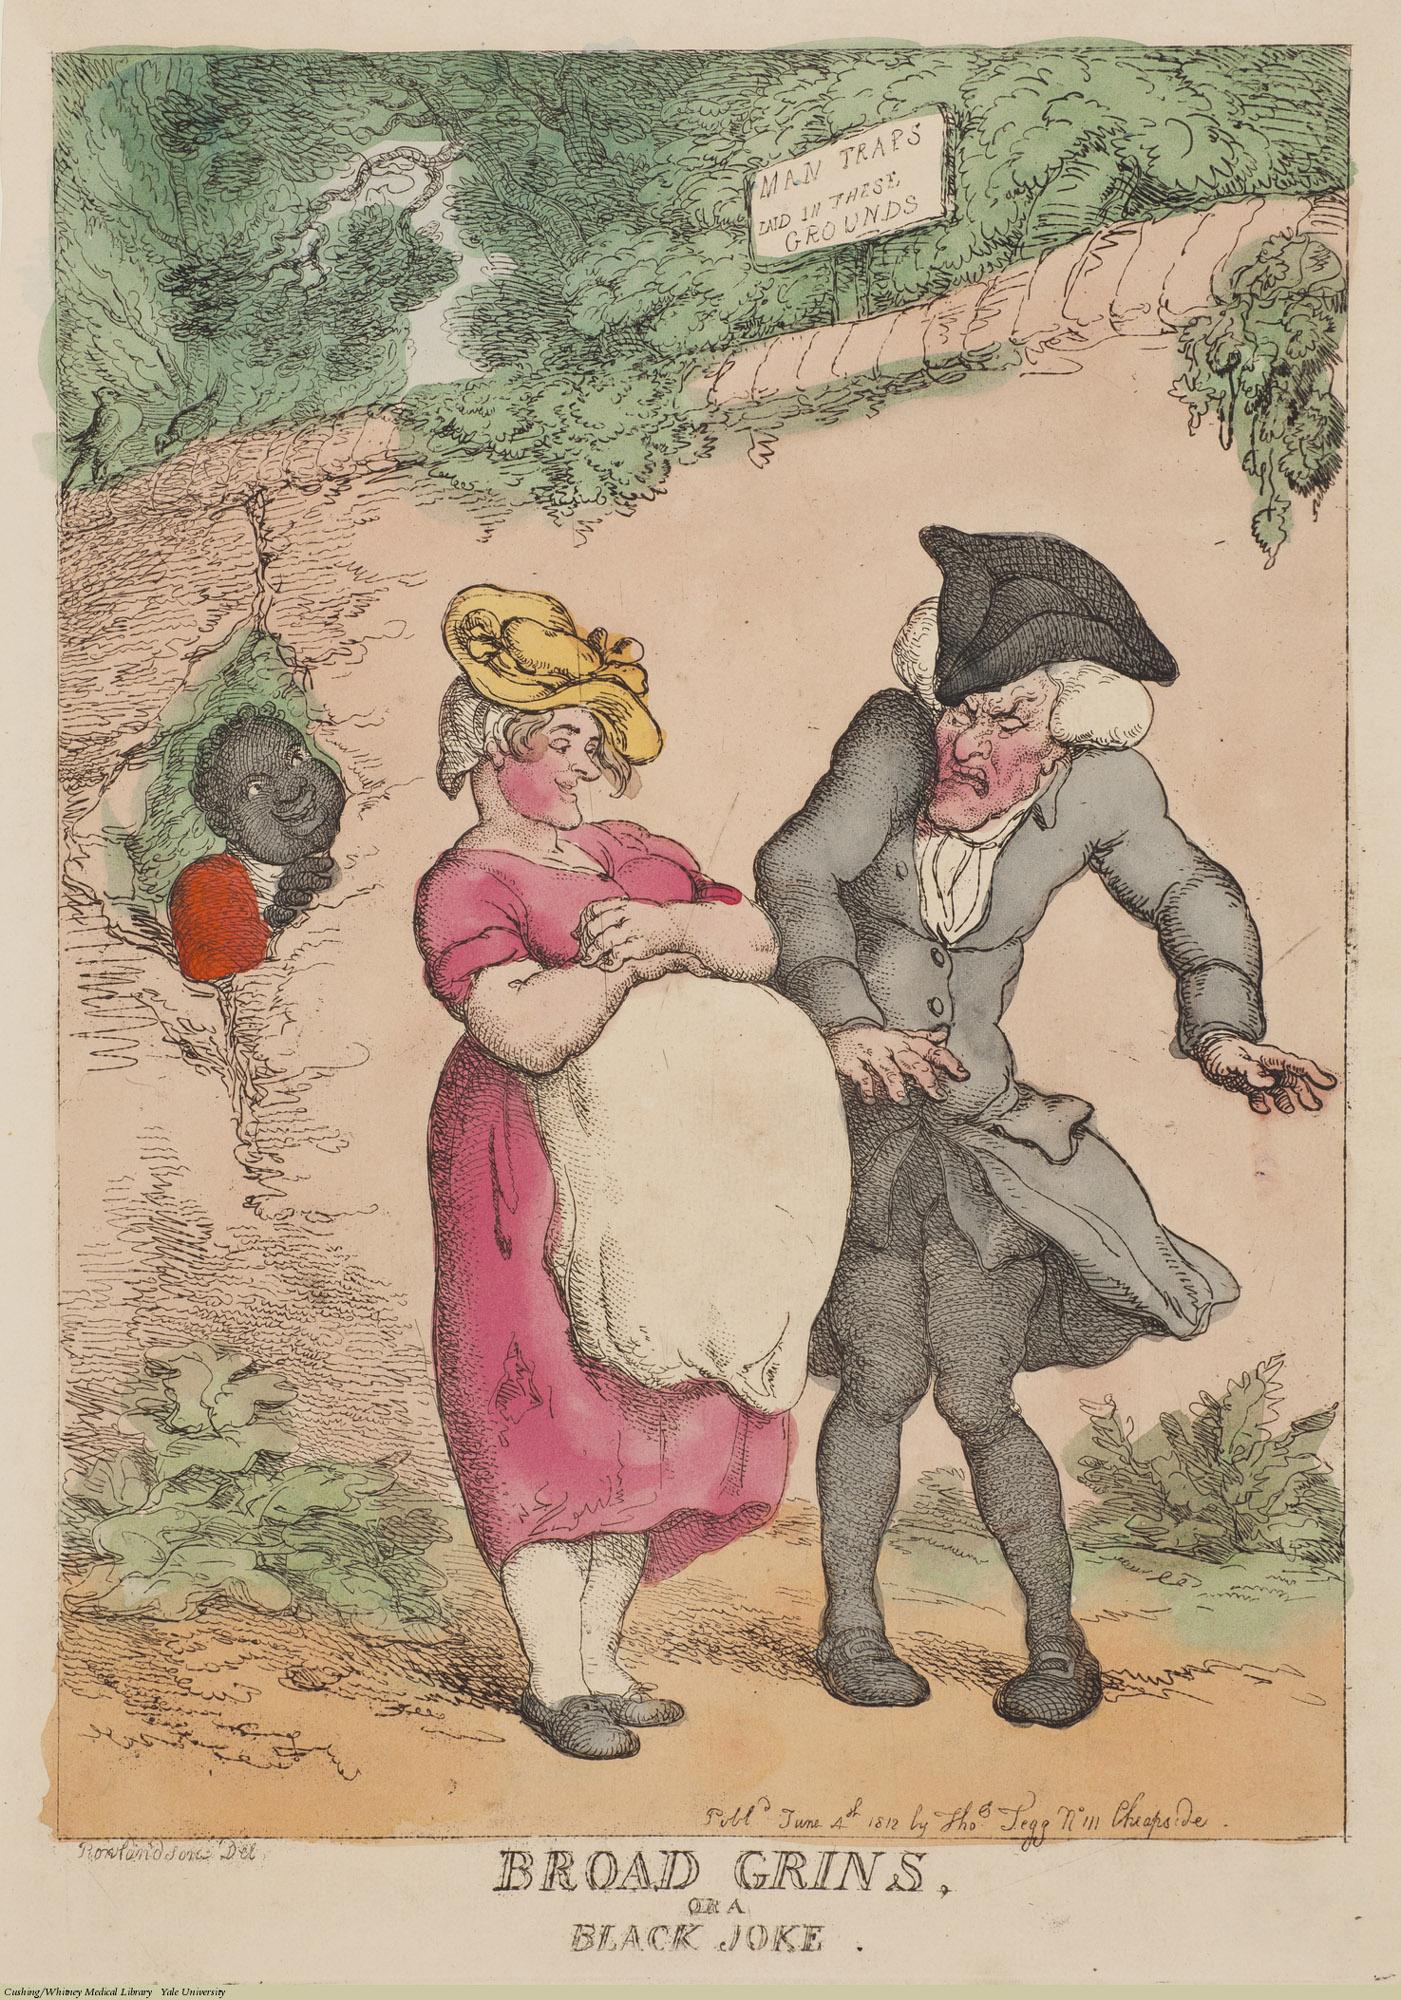 Broad Grins, or a Black Joke. Thomas Rowlandson, Etching coloured, 1812. Subject: Pregnancy, Misogyny.